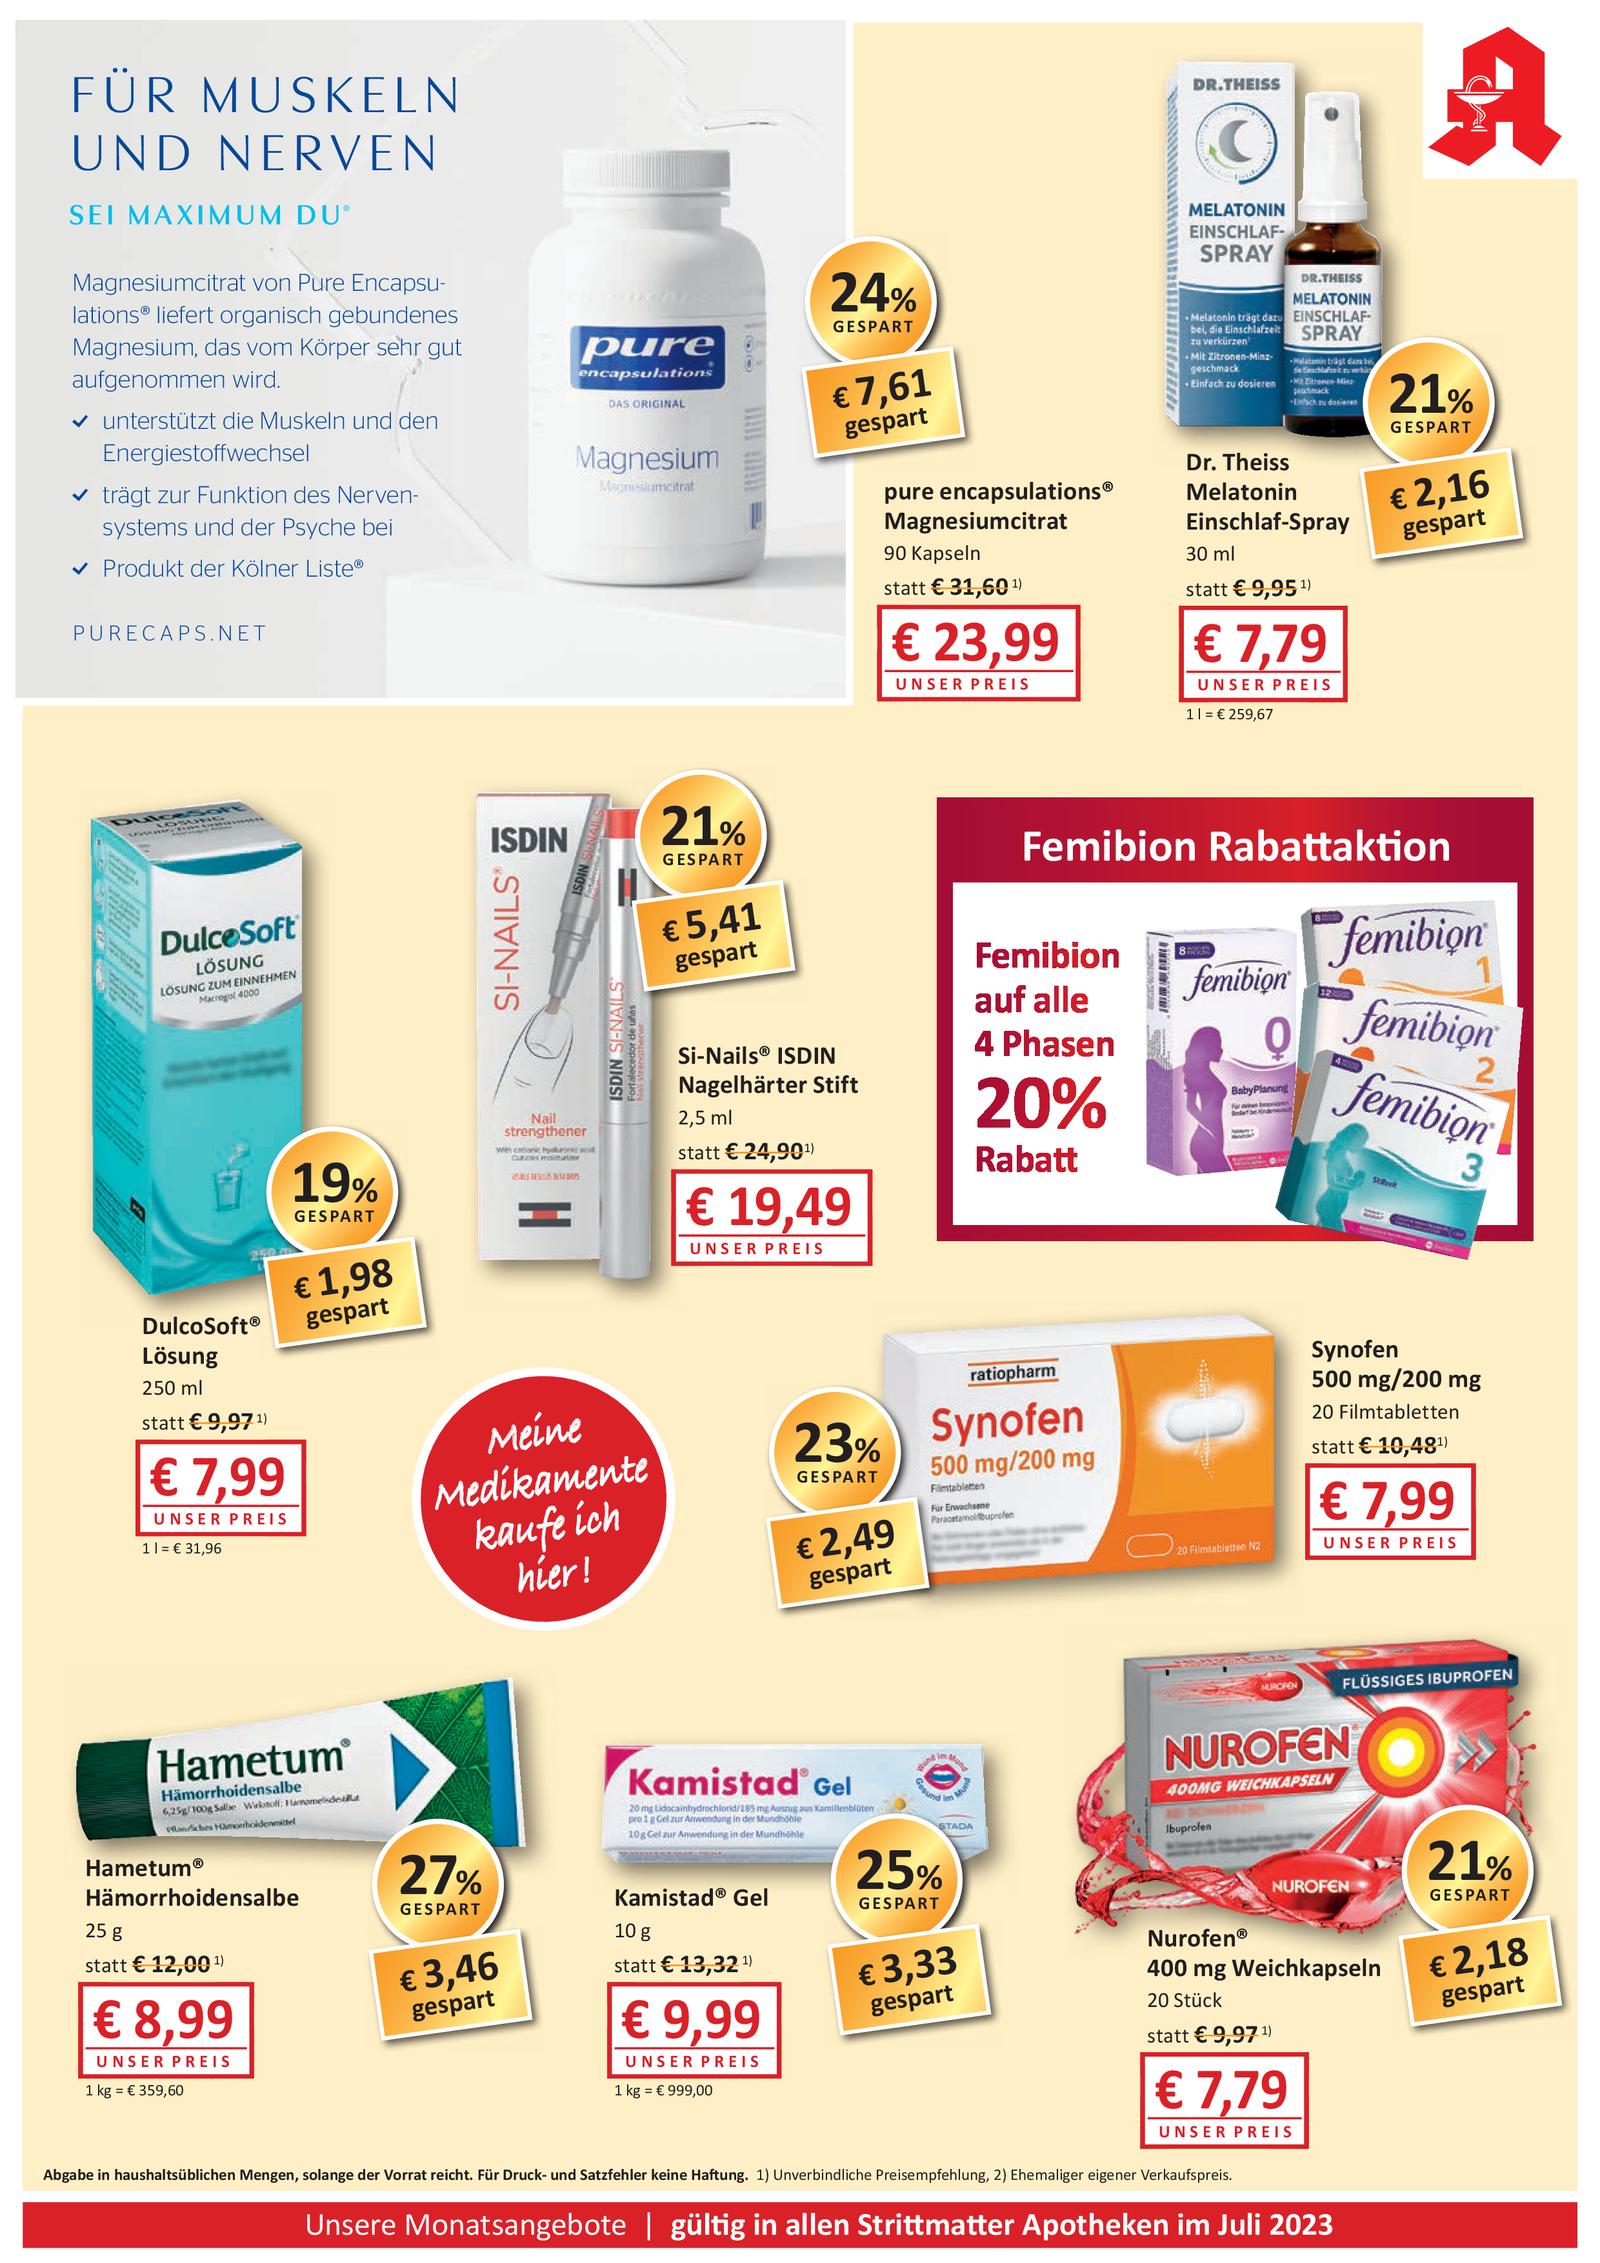 https://mein-uploads.apocdn.net/16786/leaflets/16786_flyer-Seite3.png